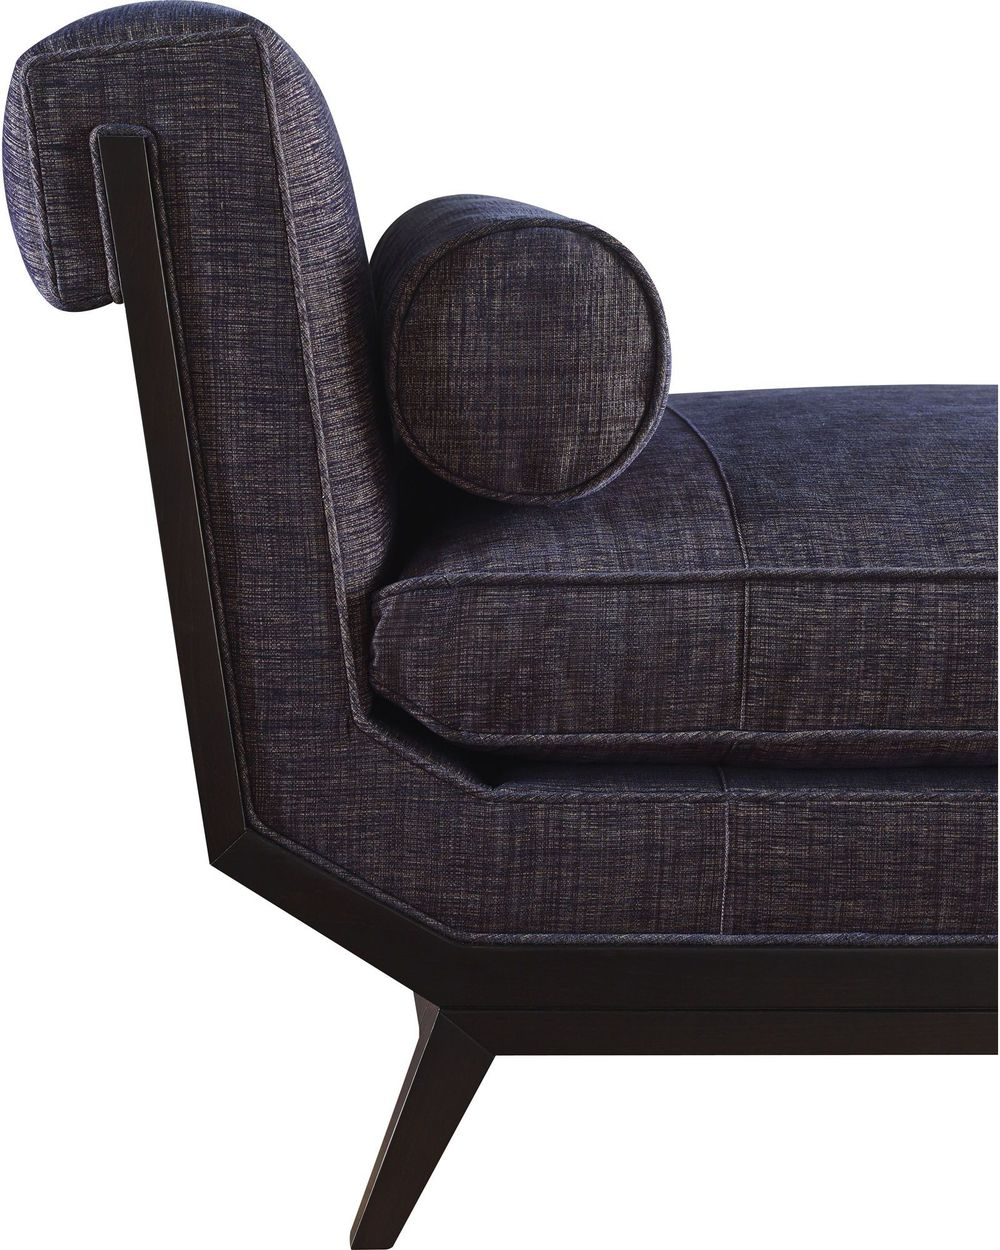 Baker Furniture - Lola Chaise